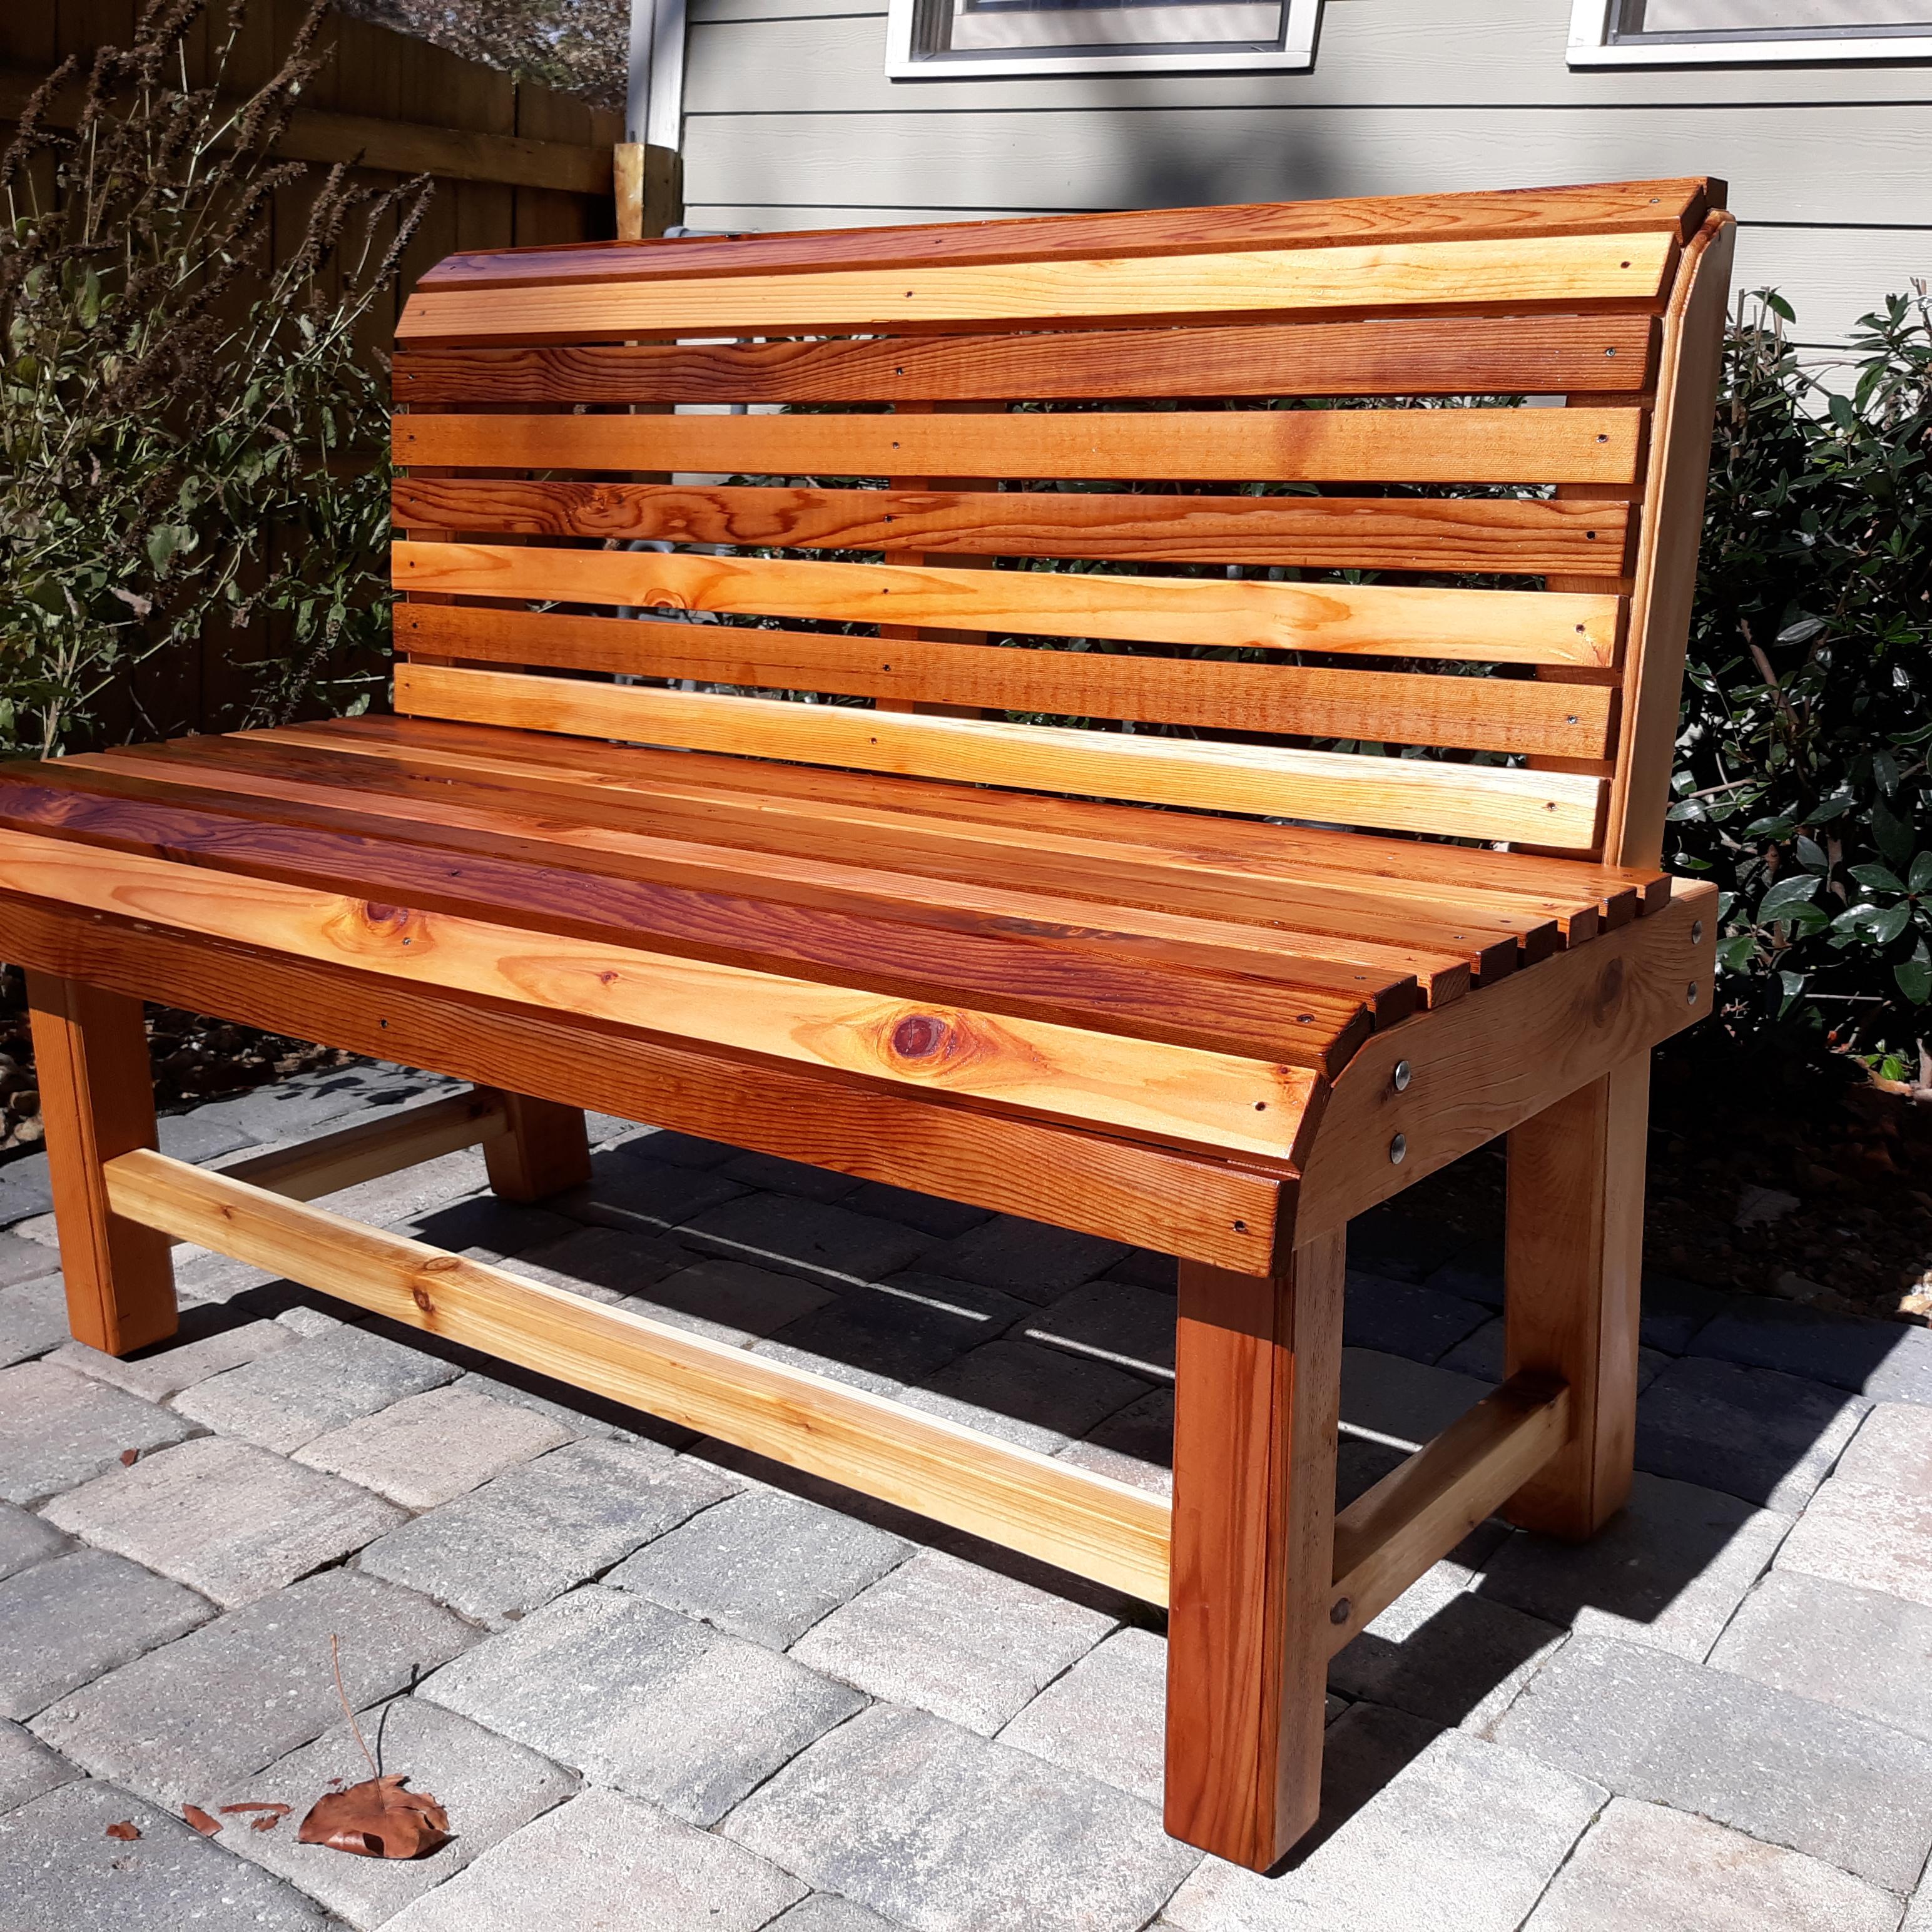 The Midtown Wood Bench Georgia Swings